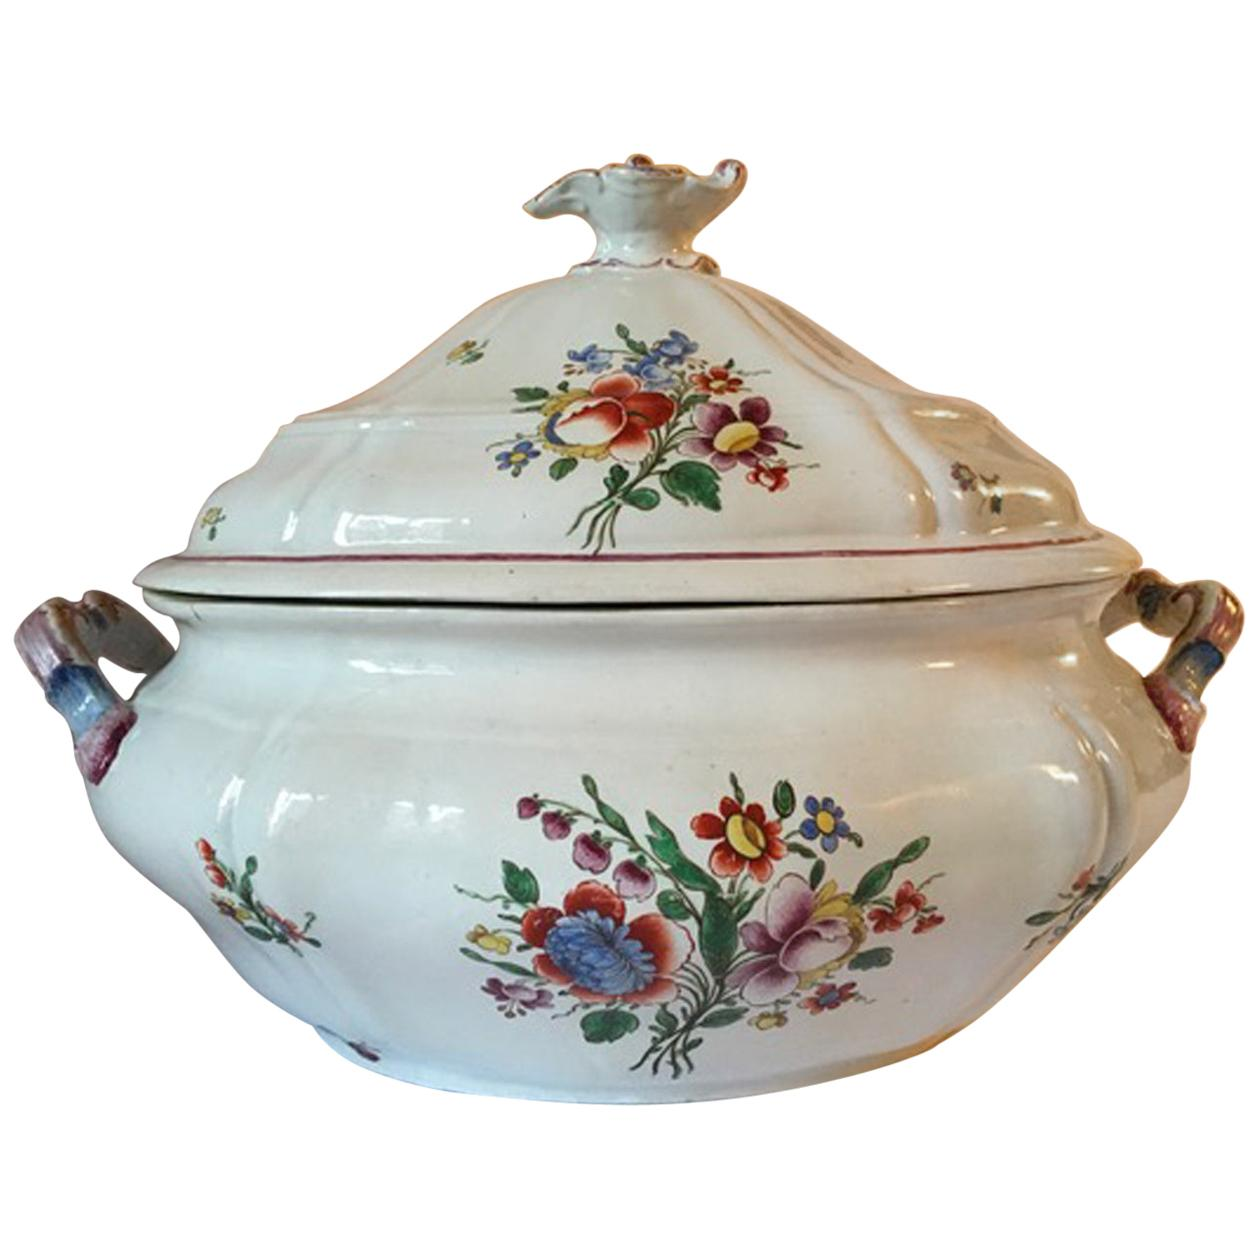 Italy Late 18th Century Porcelain Richard Ginori Doccia Soup Bowl